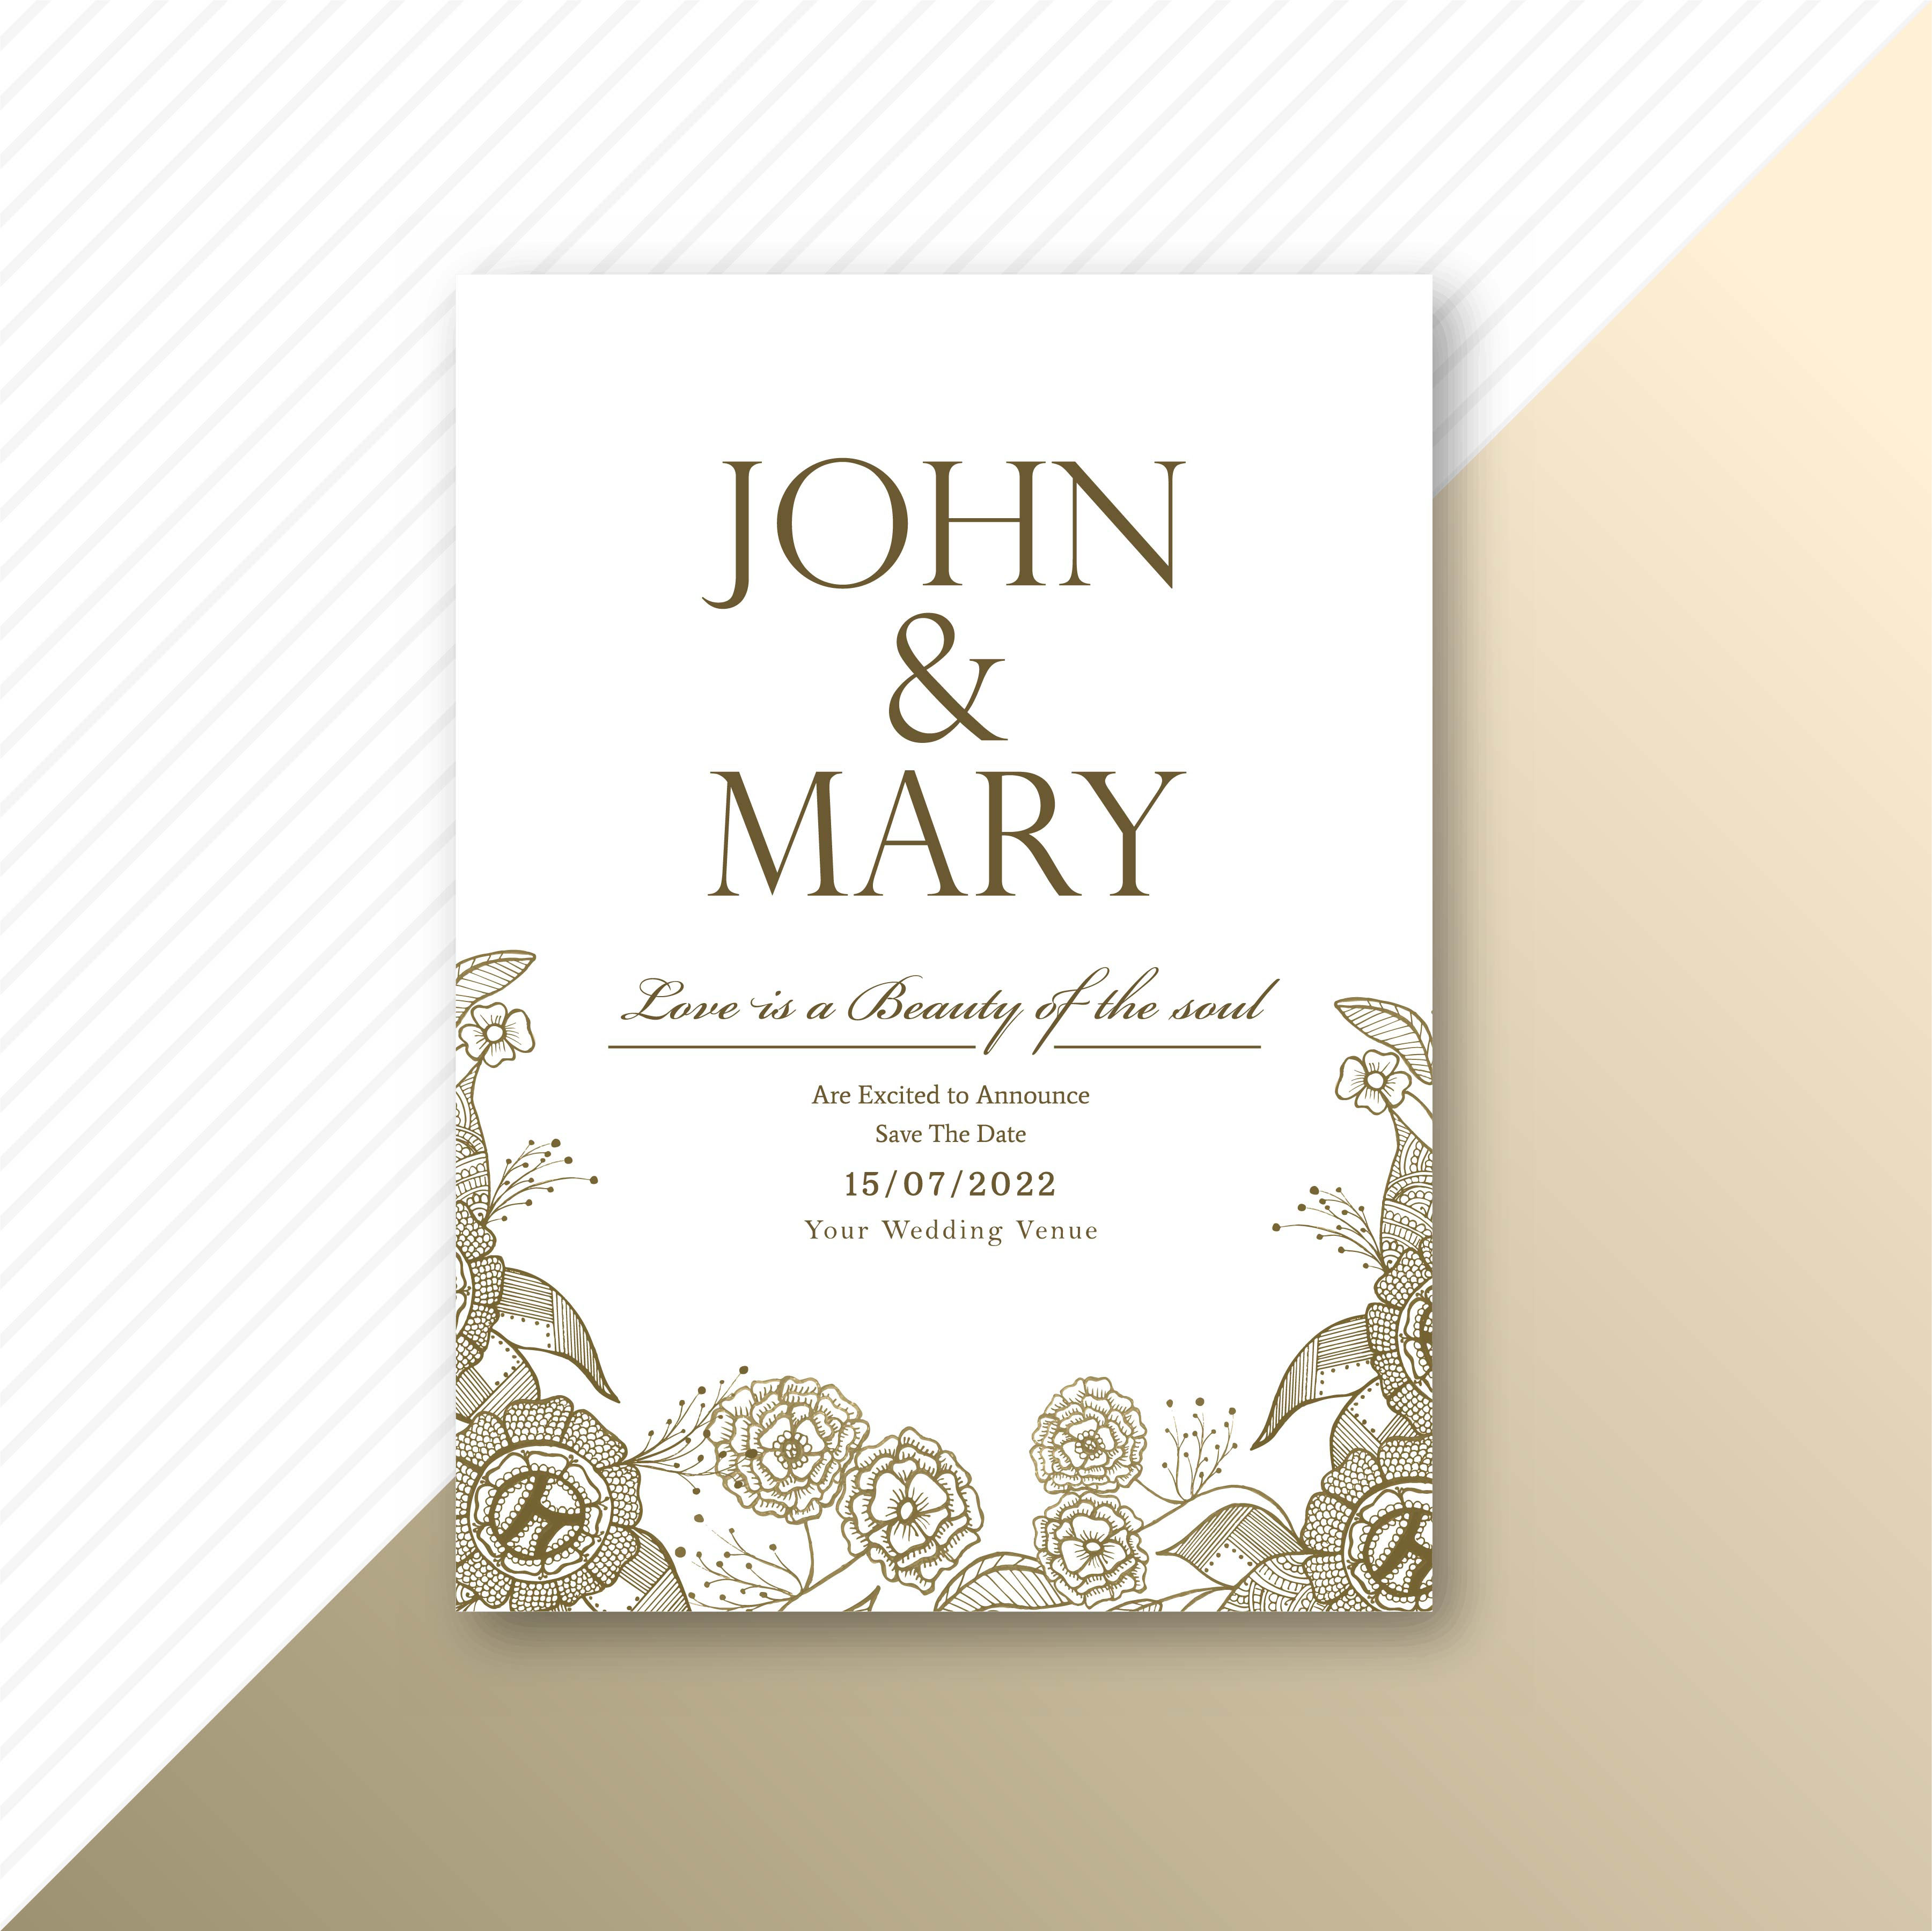 Floral decorative wedding invitation card template design